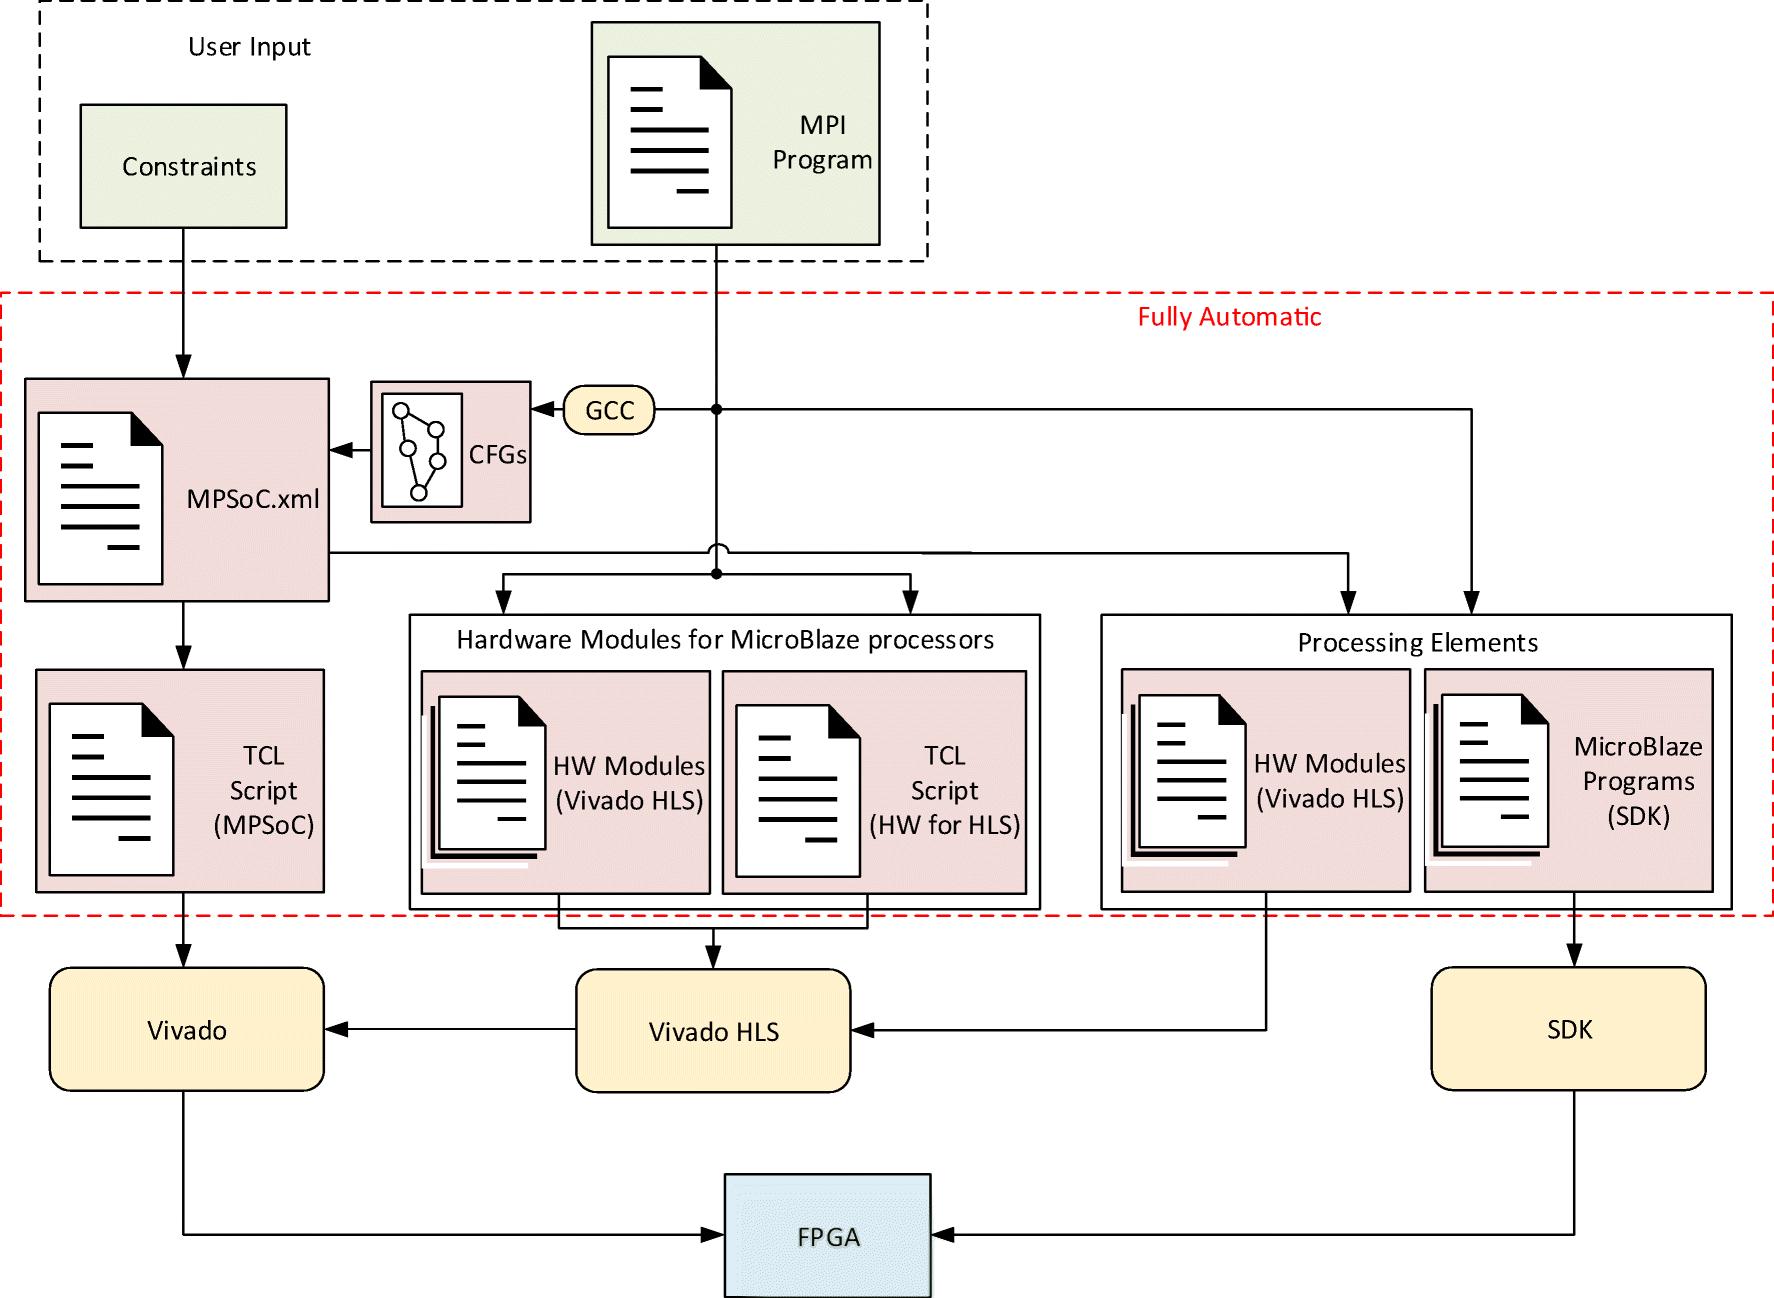 SDMPSoC: Software-Defined MPSoC for FPGAs | SpringerLink